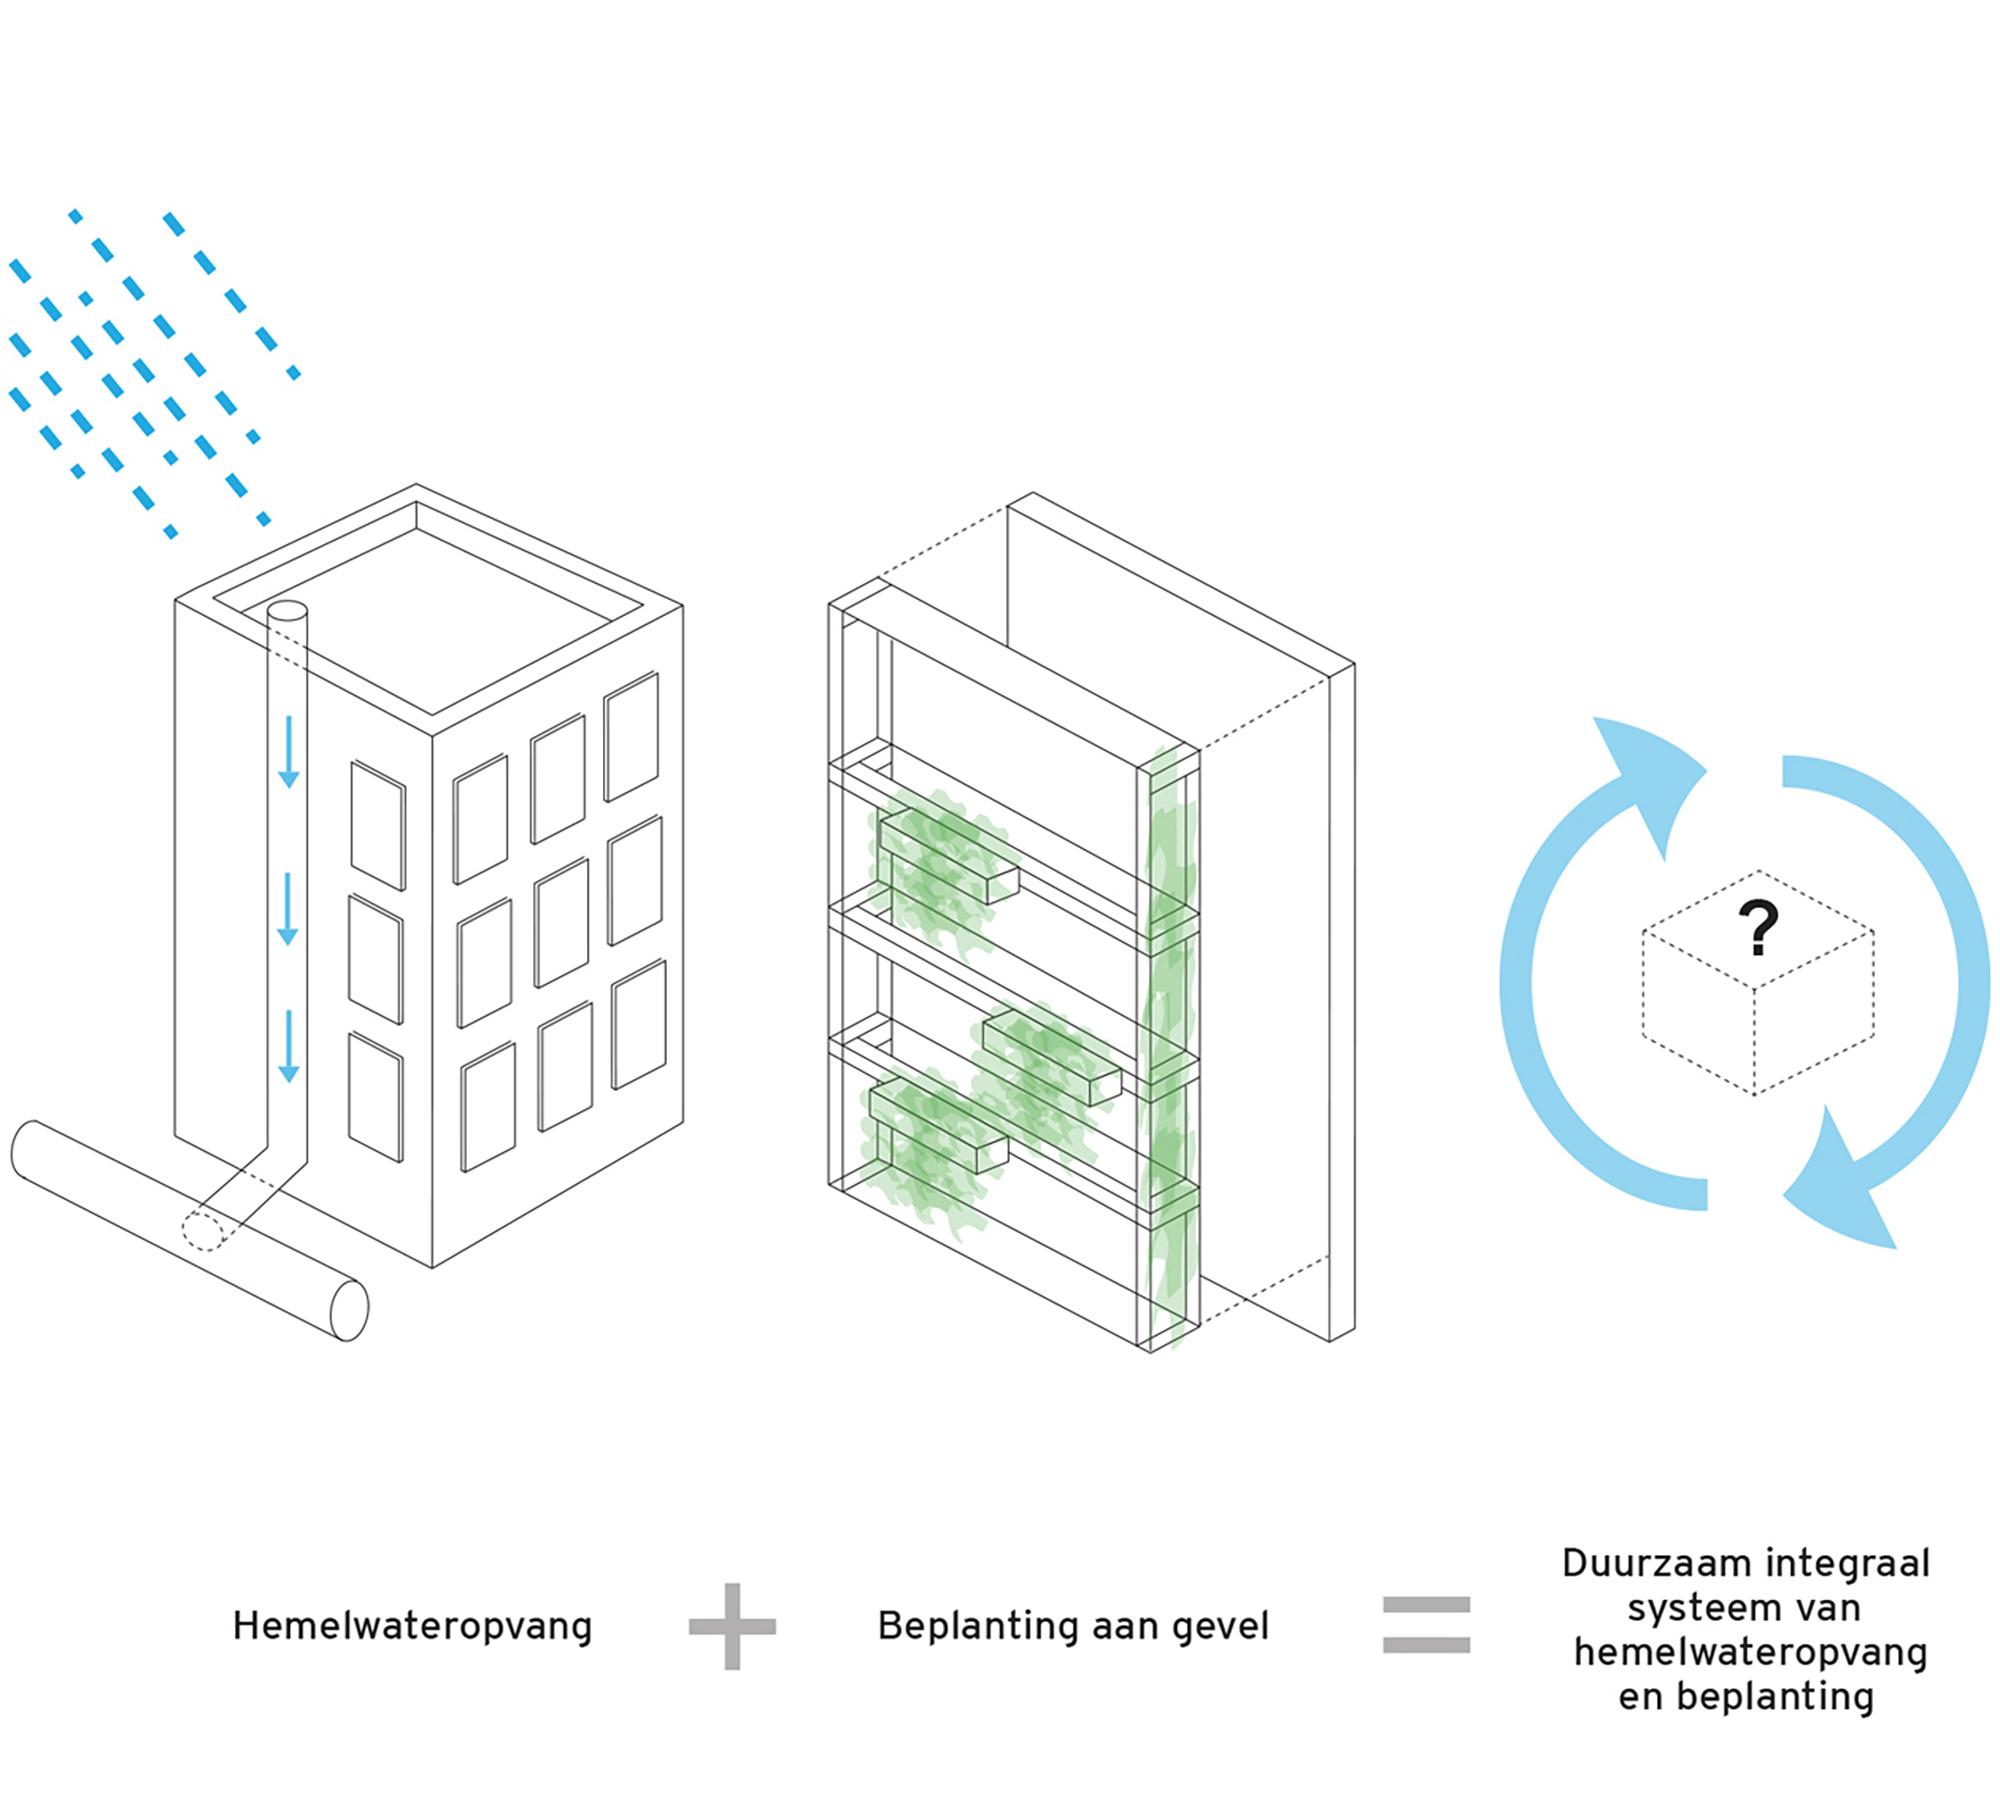 groene_regenpijp_schema-duurzaam-integraal-systeem_vierkant